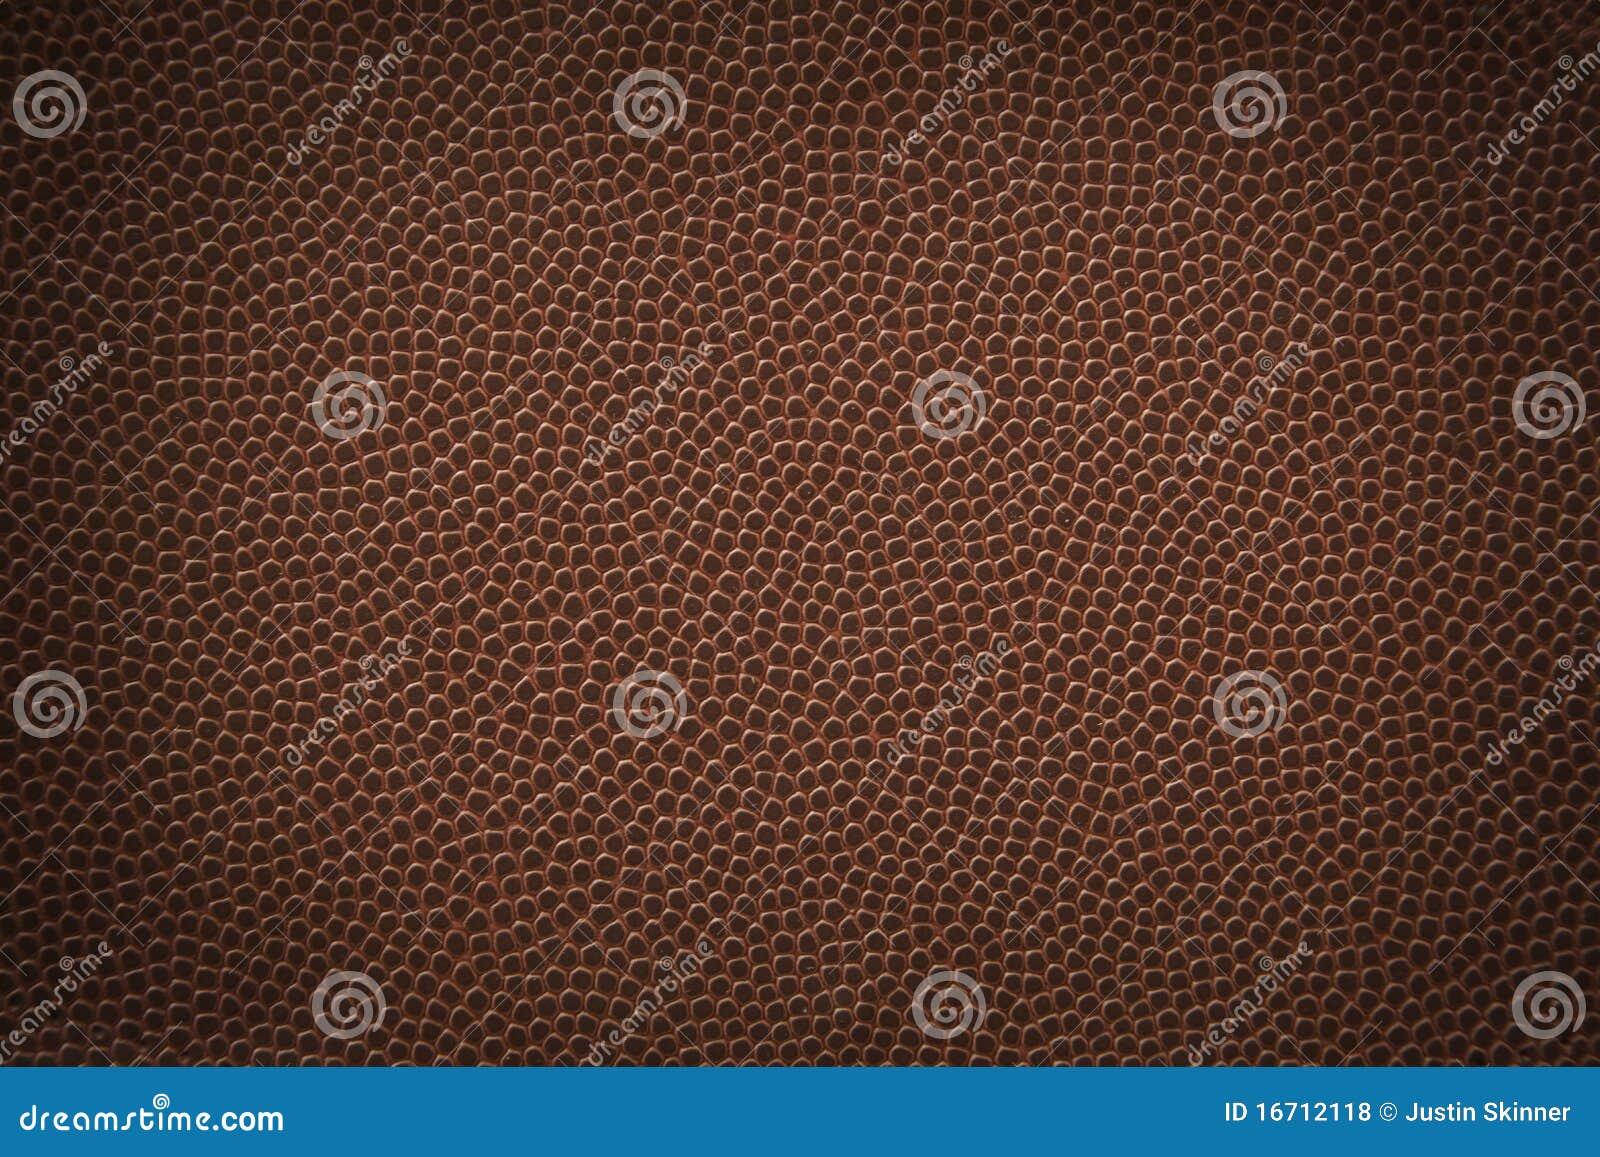 Fotbolltextur